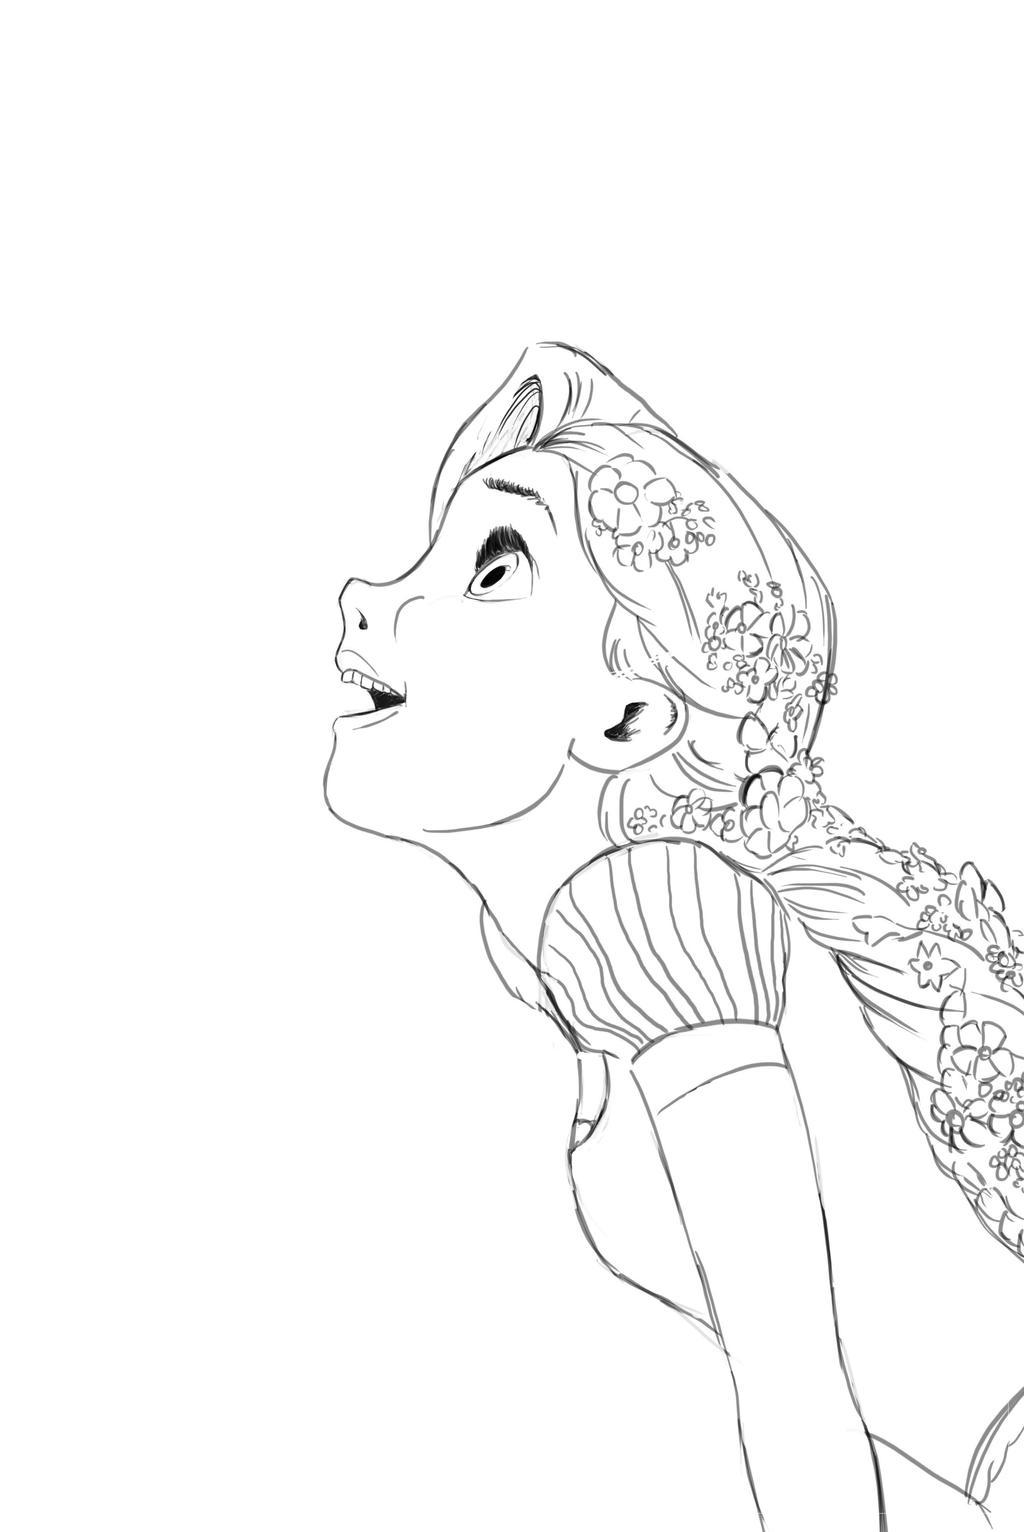 Rapunzel Lineart : Rapunzel lineart by mrsyaf on deviantart